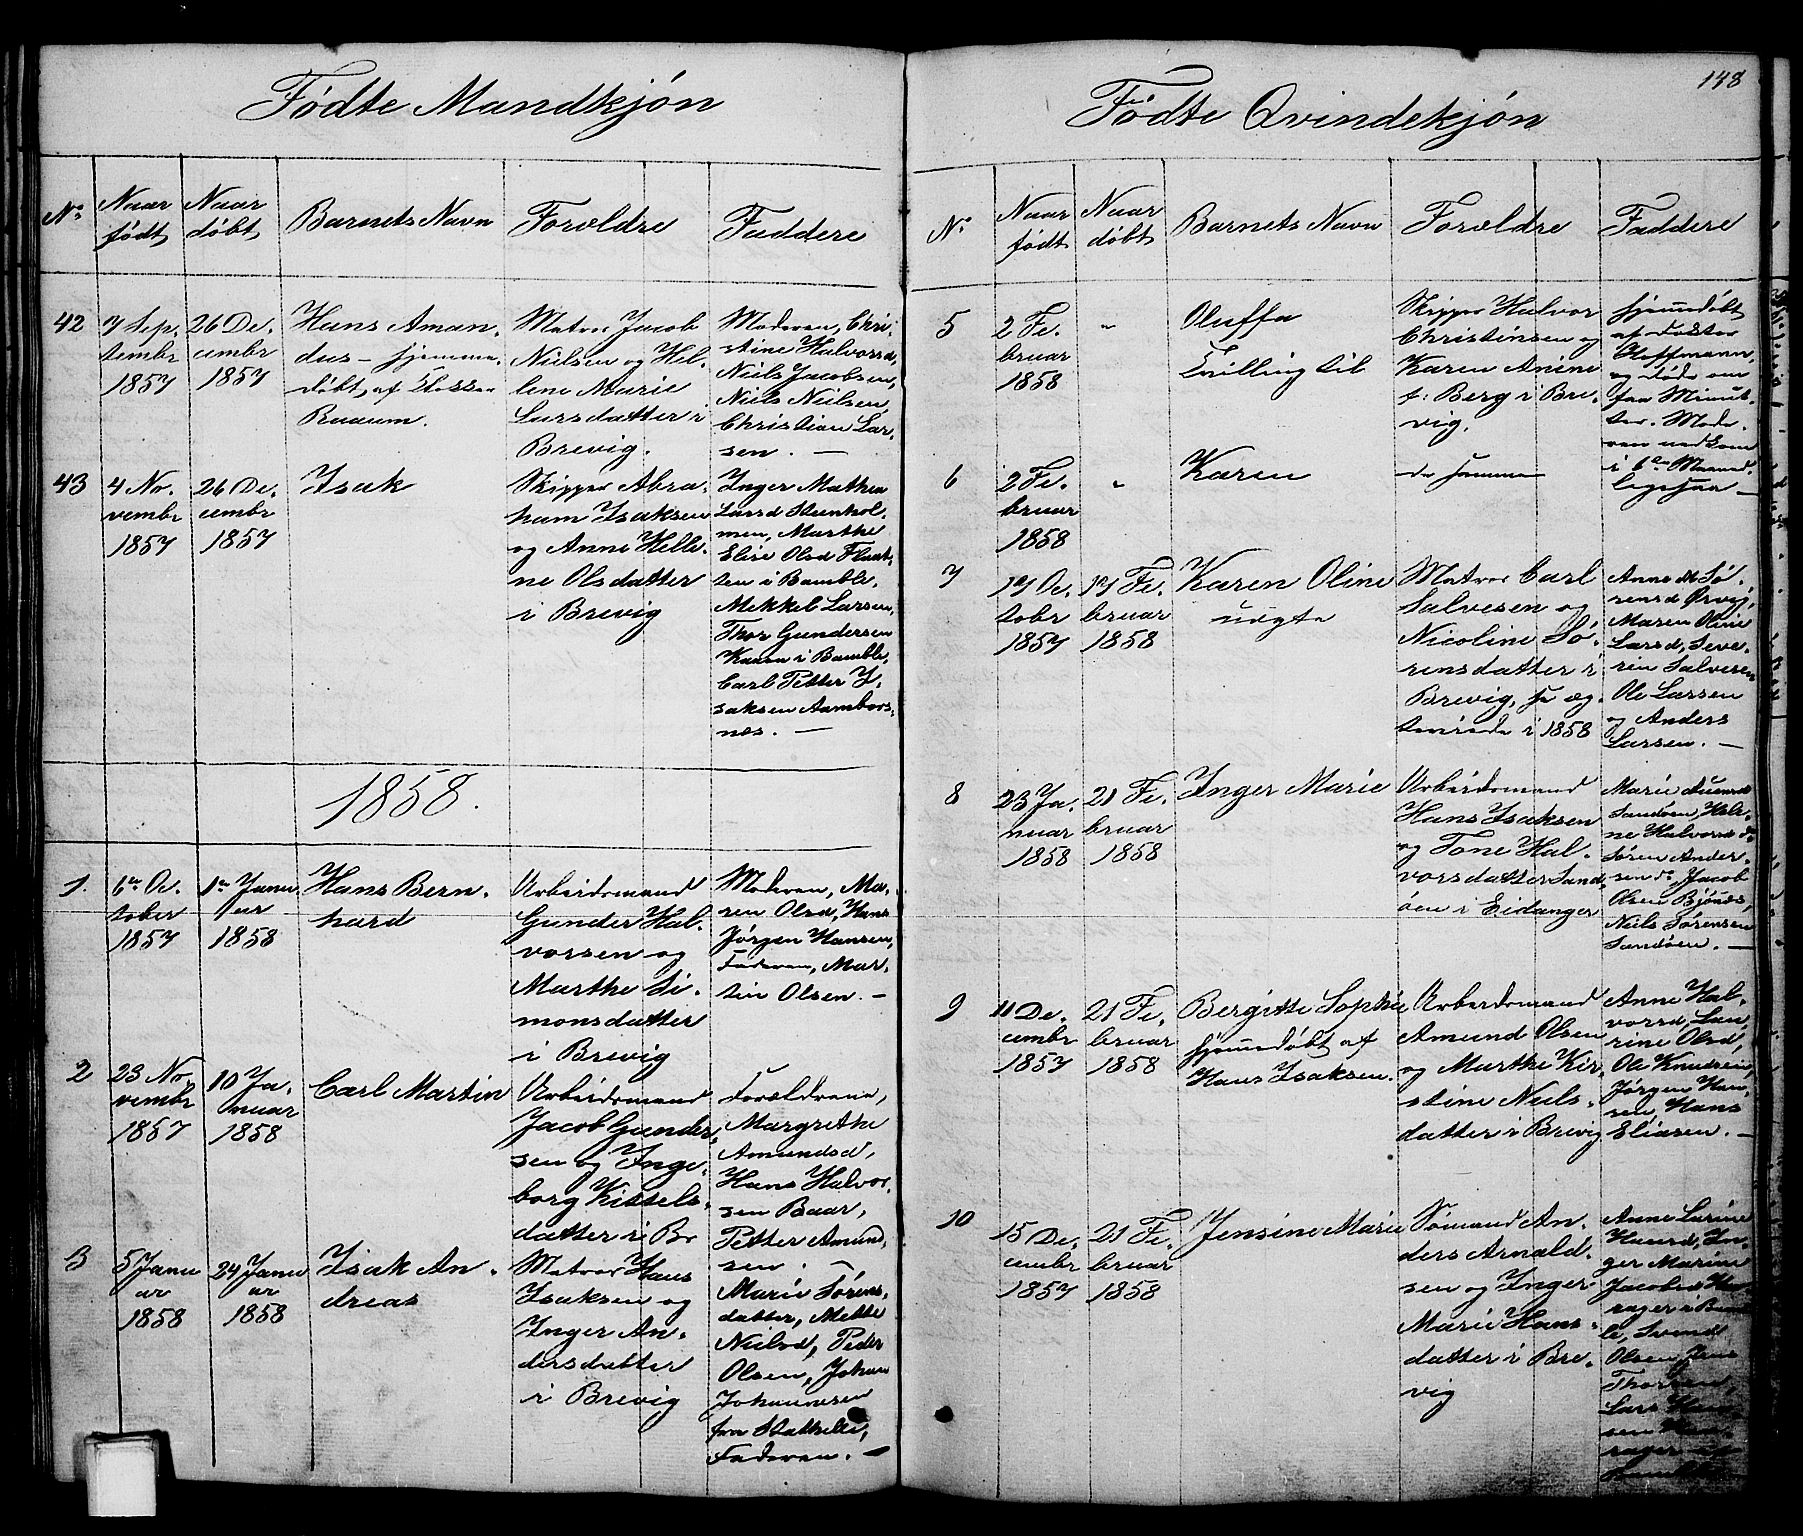 SAKO, Brevik kirkebøker, G/Ga/L0002: Klokkerbok nr. 2, 1846-1865, s. 148